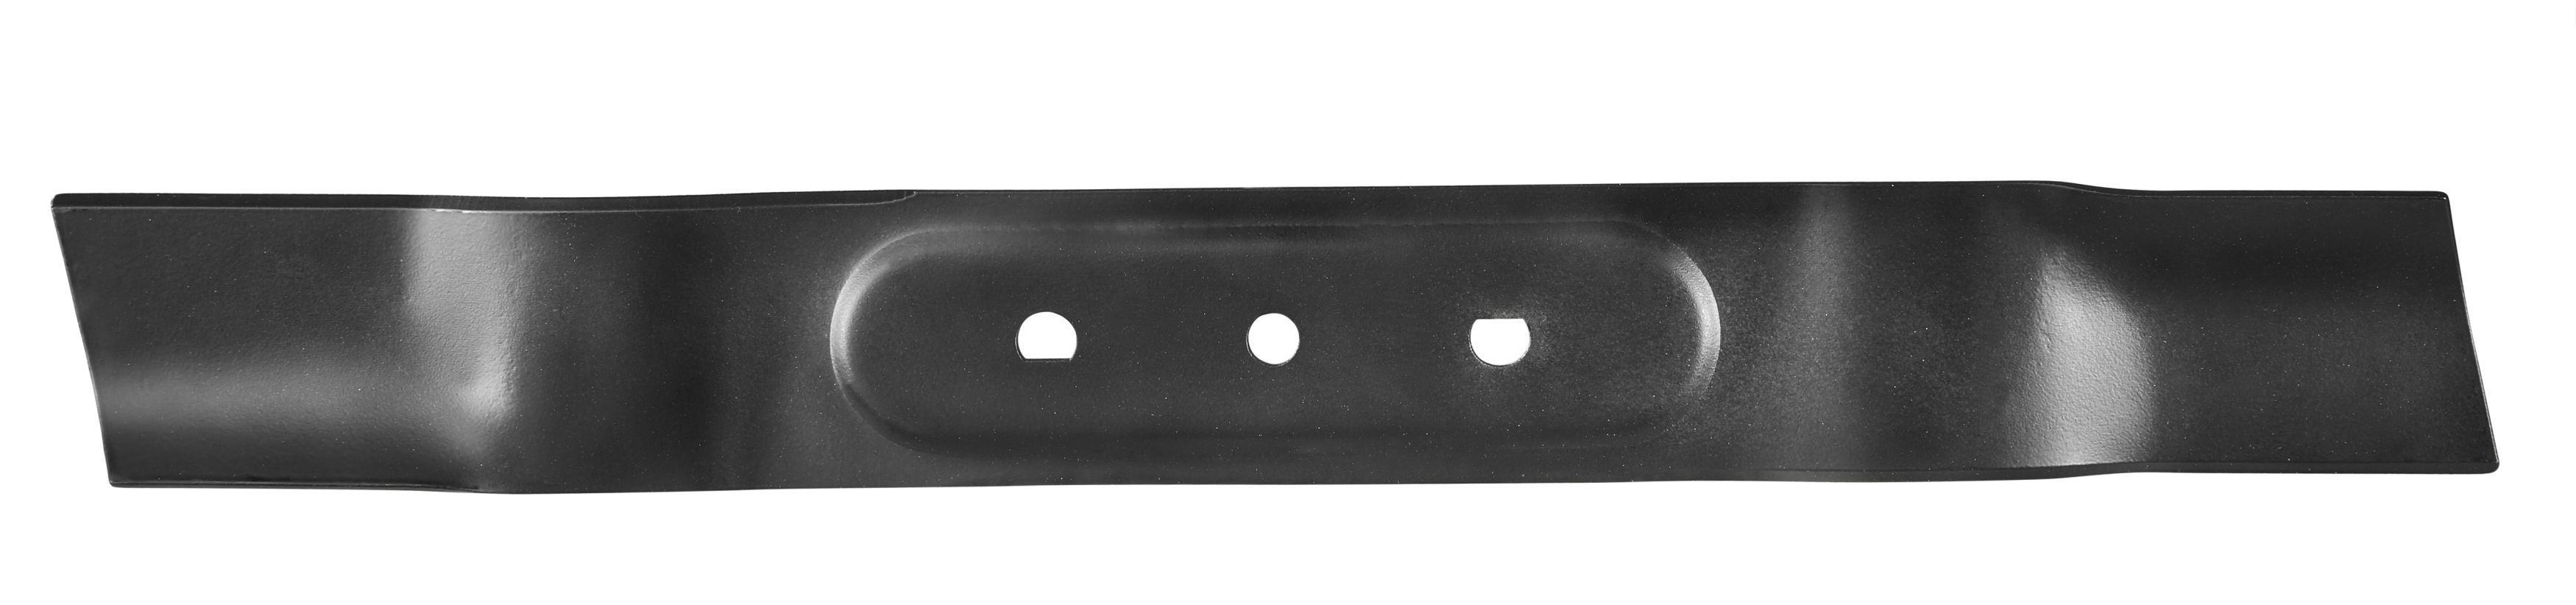 Нож Gardena Powermax li-40/41 04104-20 gardena 01355 20 000 00